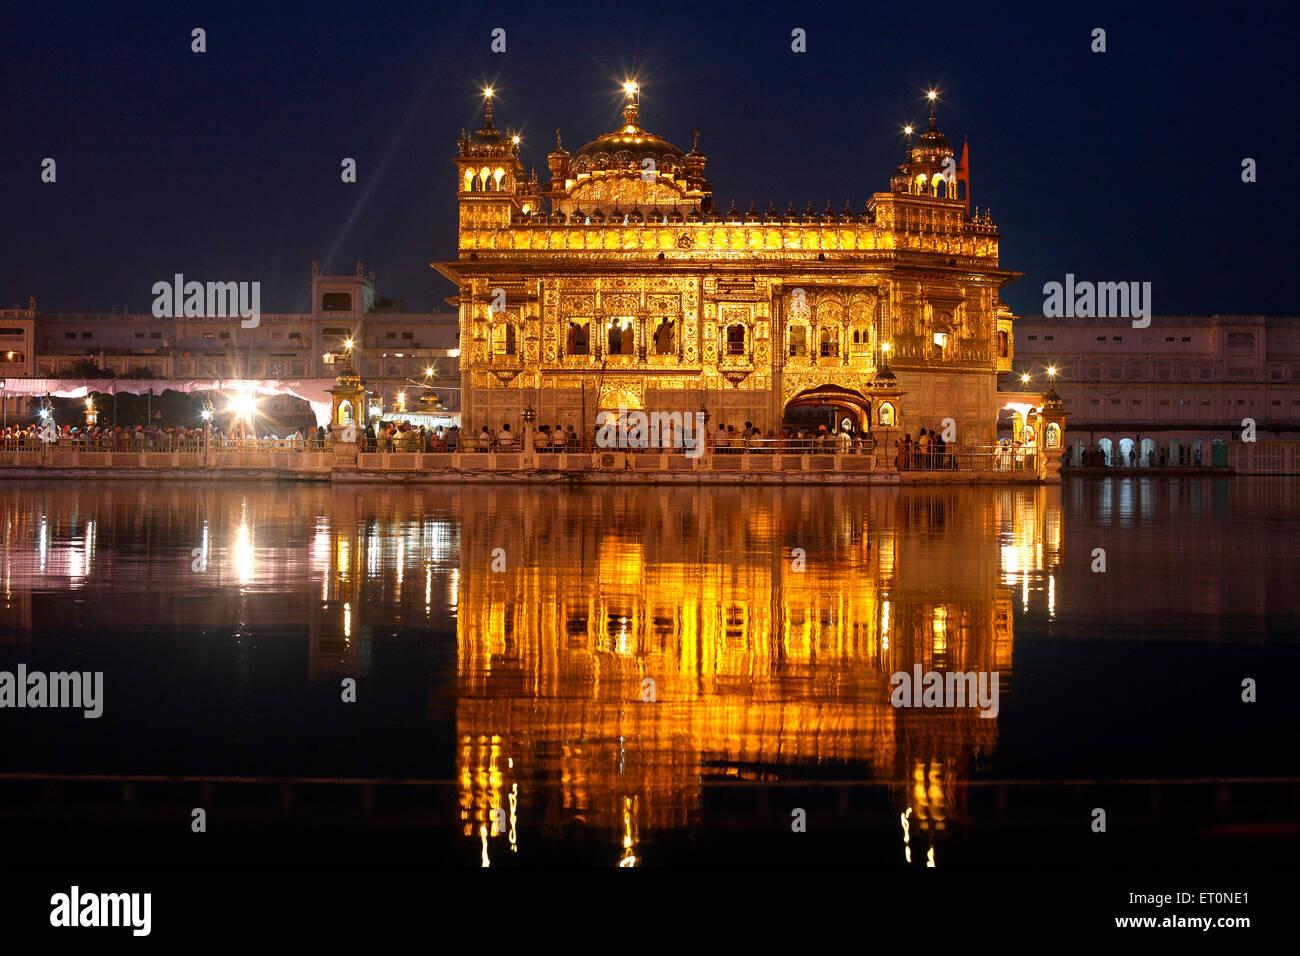 Glow of Harmandir Sahib or Darbar Sahib or Golden temple reflection in lake in Amritsar; Punjab ; India - Stock Image